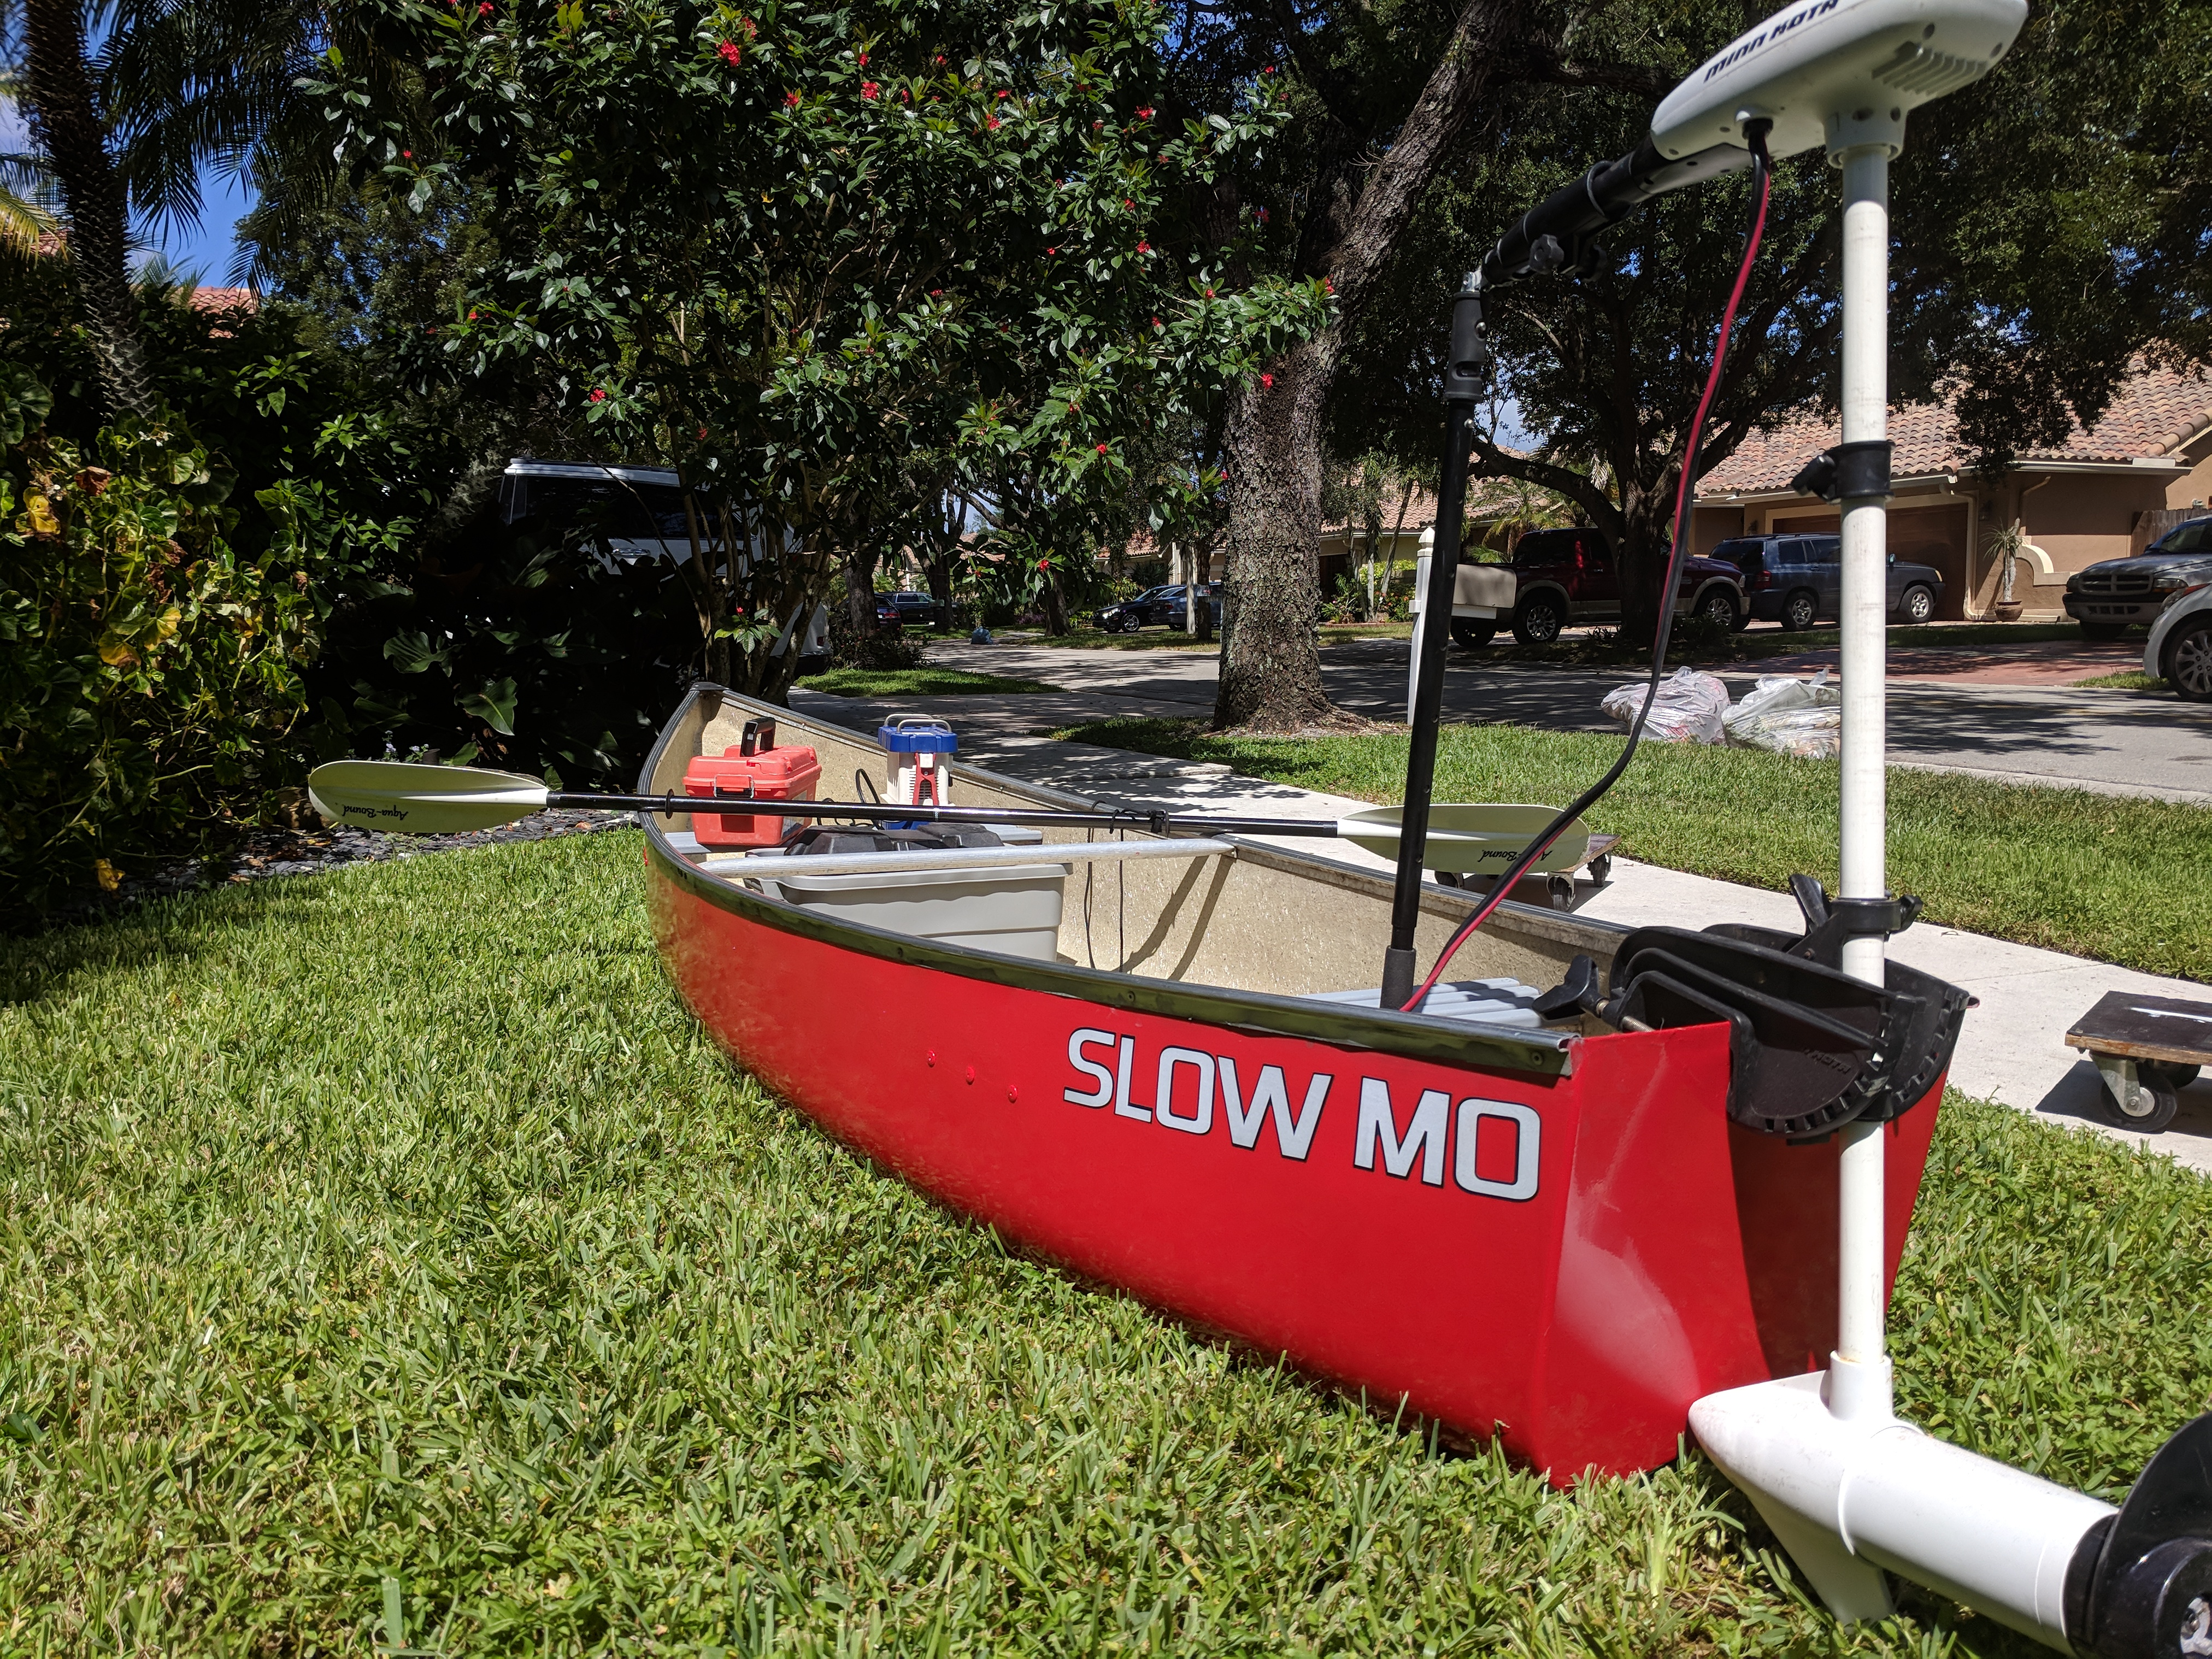 FS - Square Stern, flat bottom, canoe with trolling motor